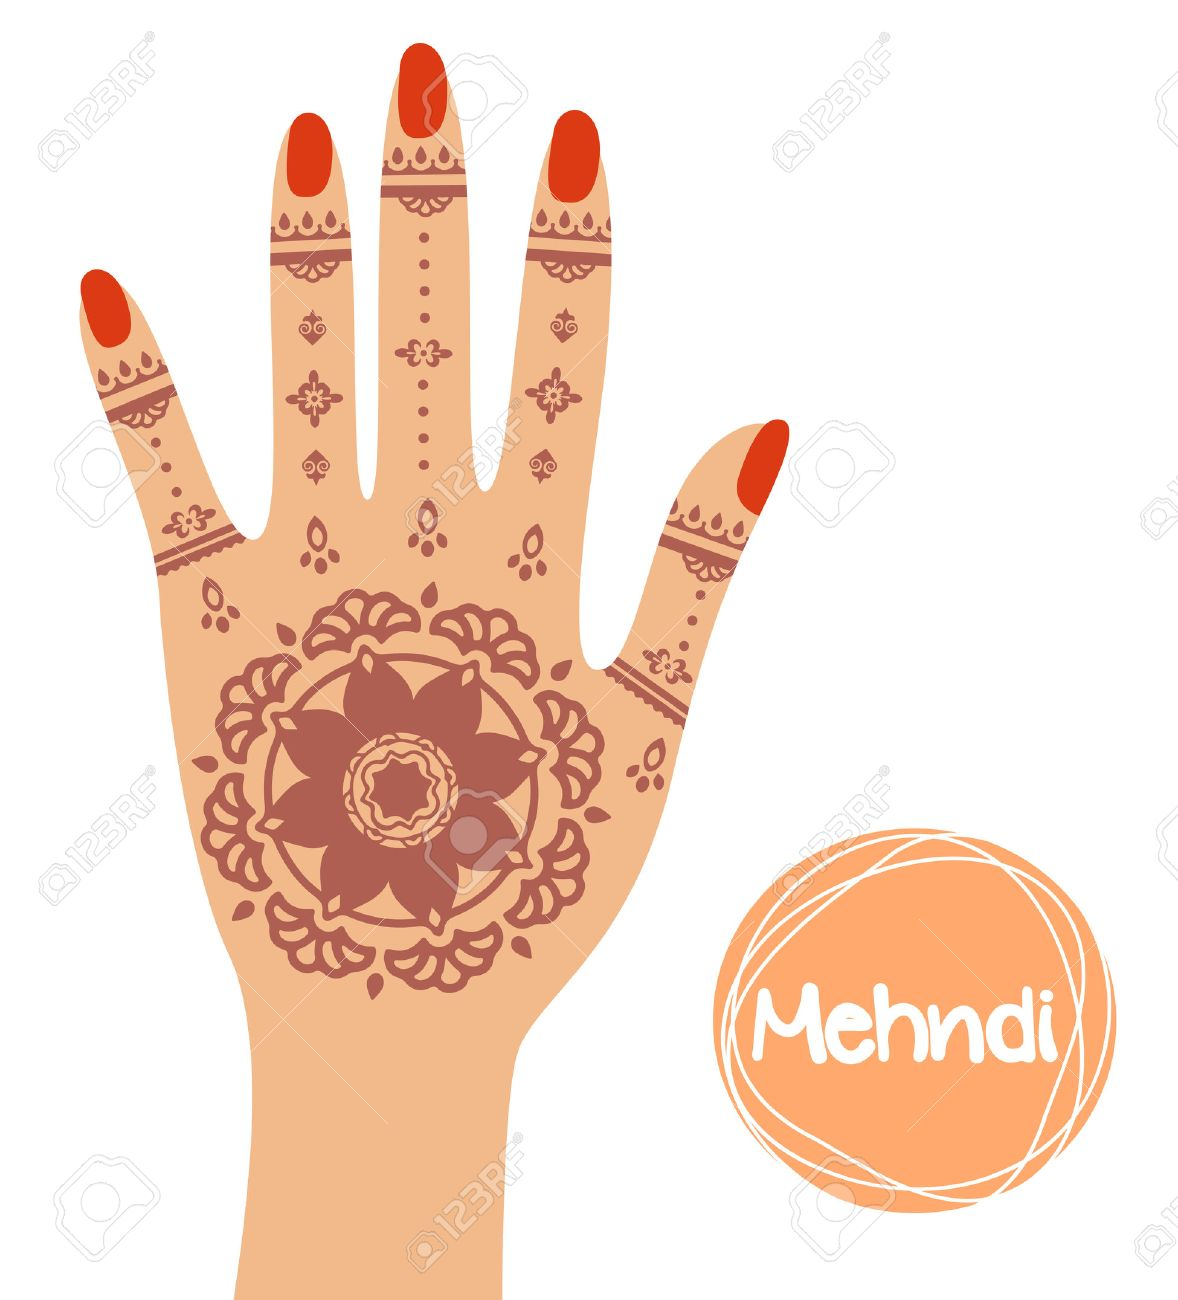 henna tattoo mehandi in hand vector illustration royalty free rh 123rf com Henna Tattoo Henna Drawings Designs